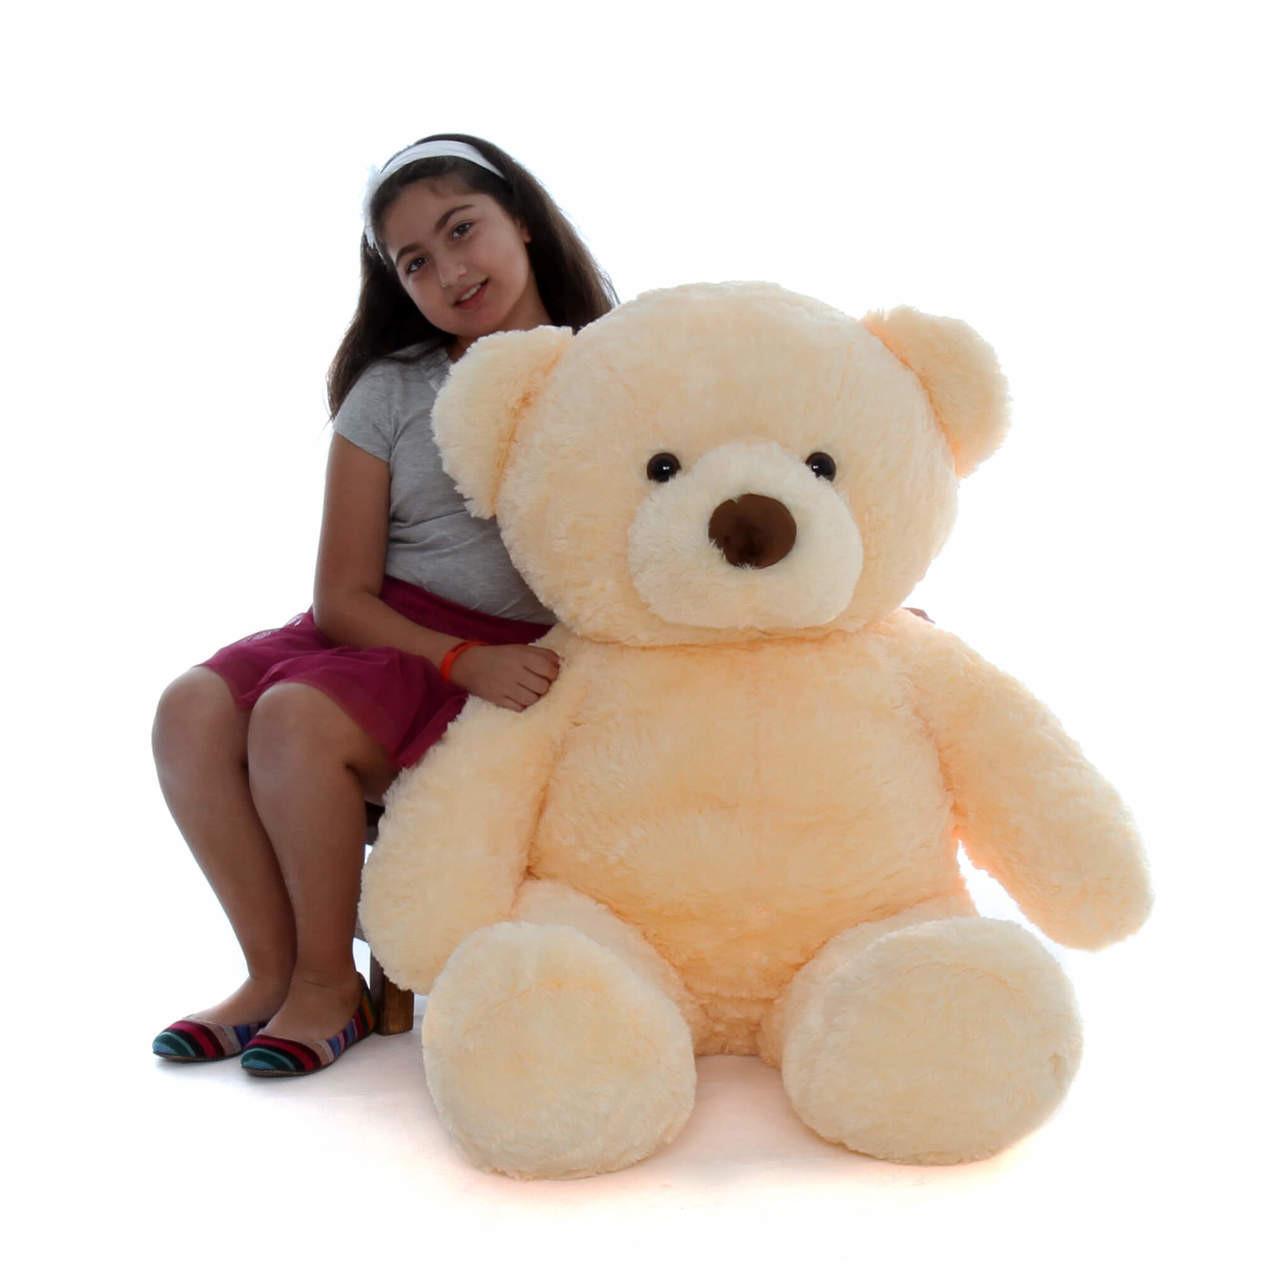 48in Smiley Chubs Giant Vanilla Cream Teddy Bear